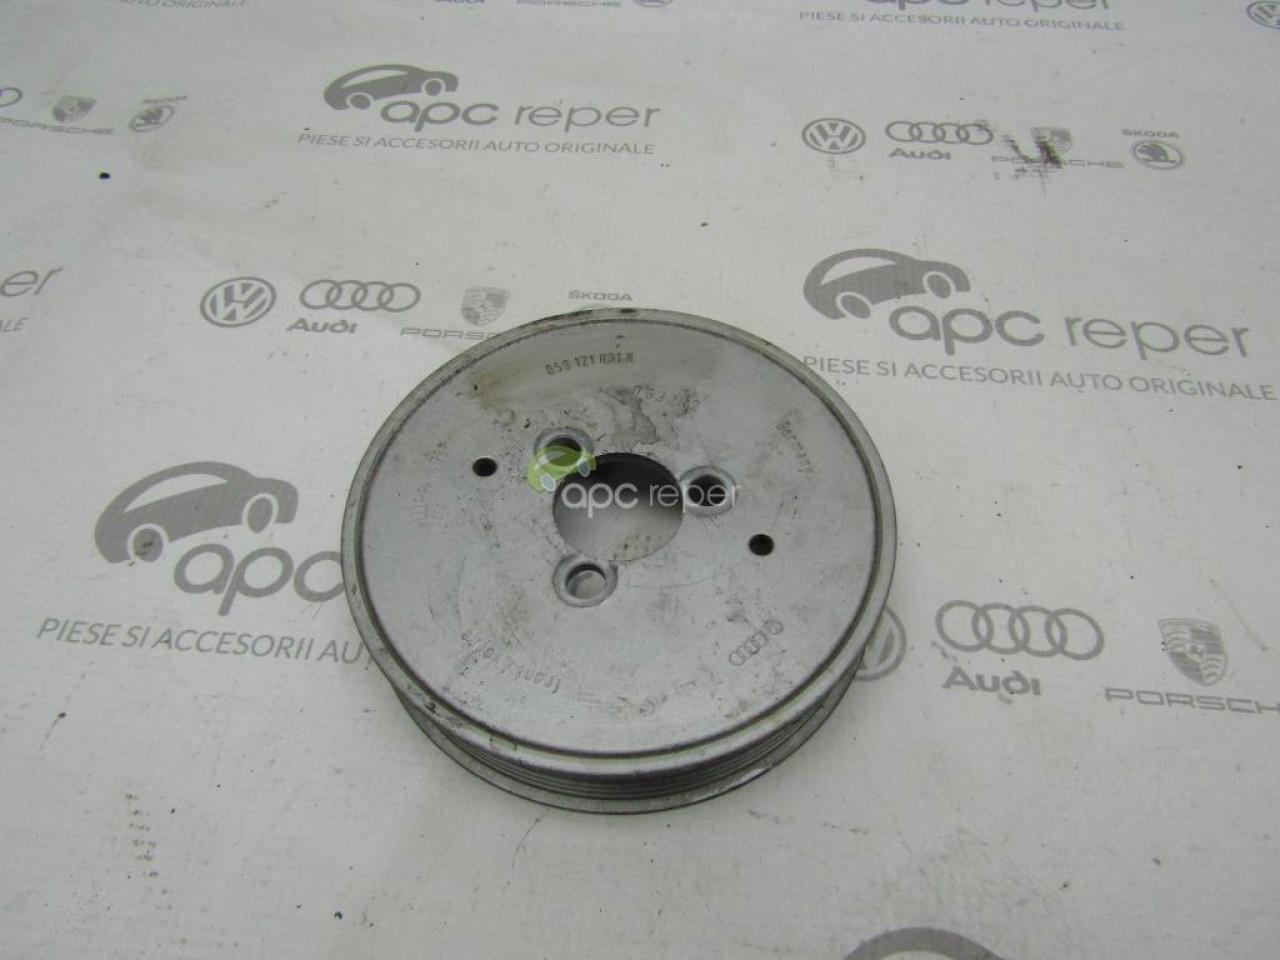 Fulie pompa apa Audi - VW - 3,0Tdi Cod OEM 059121031H